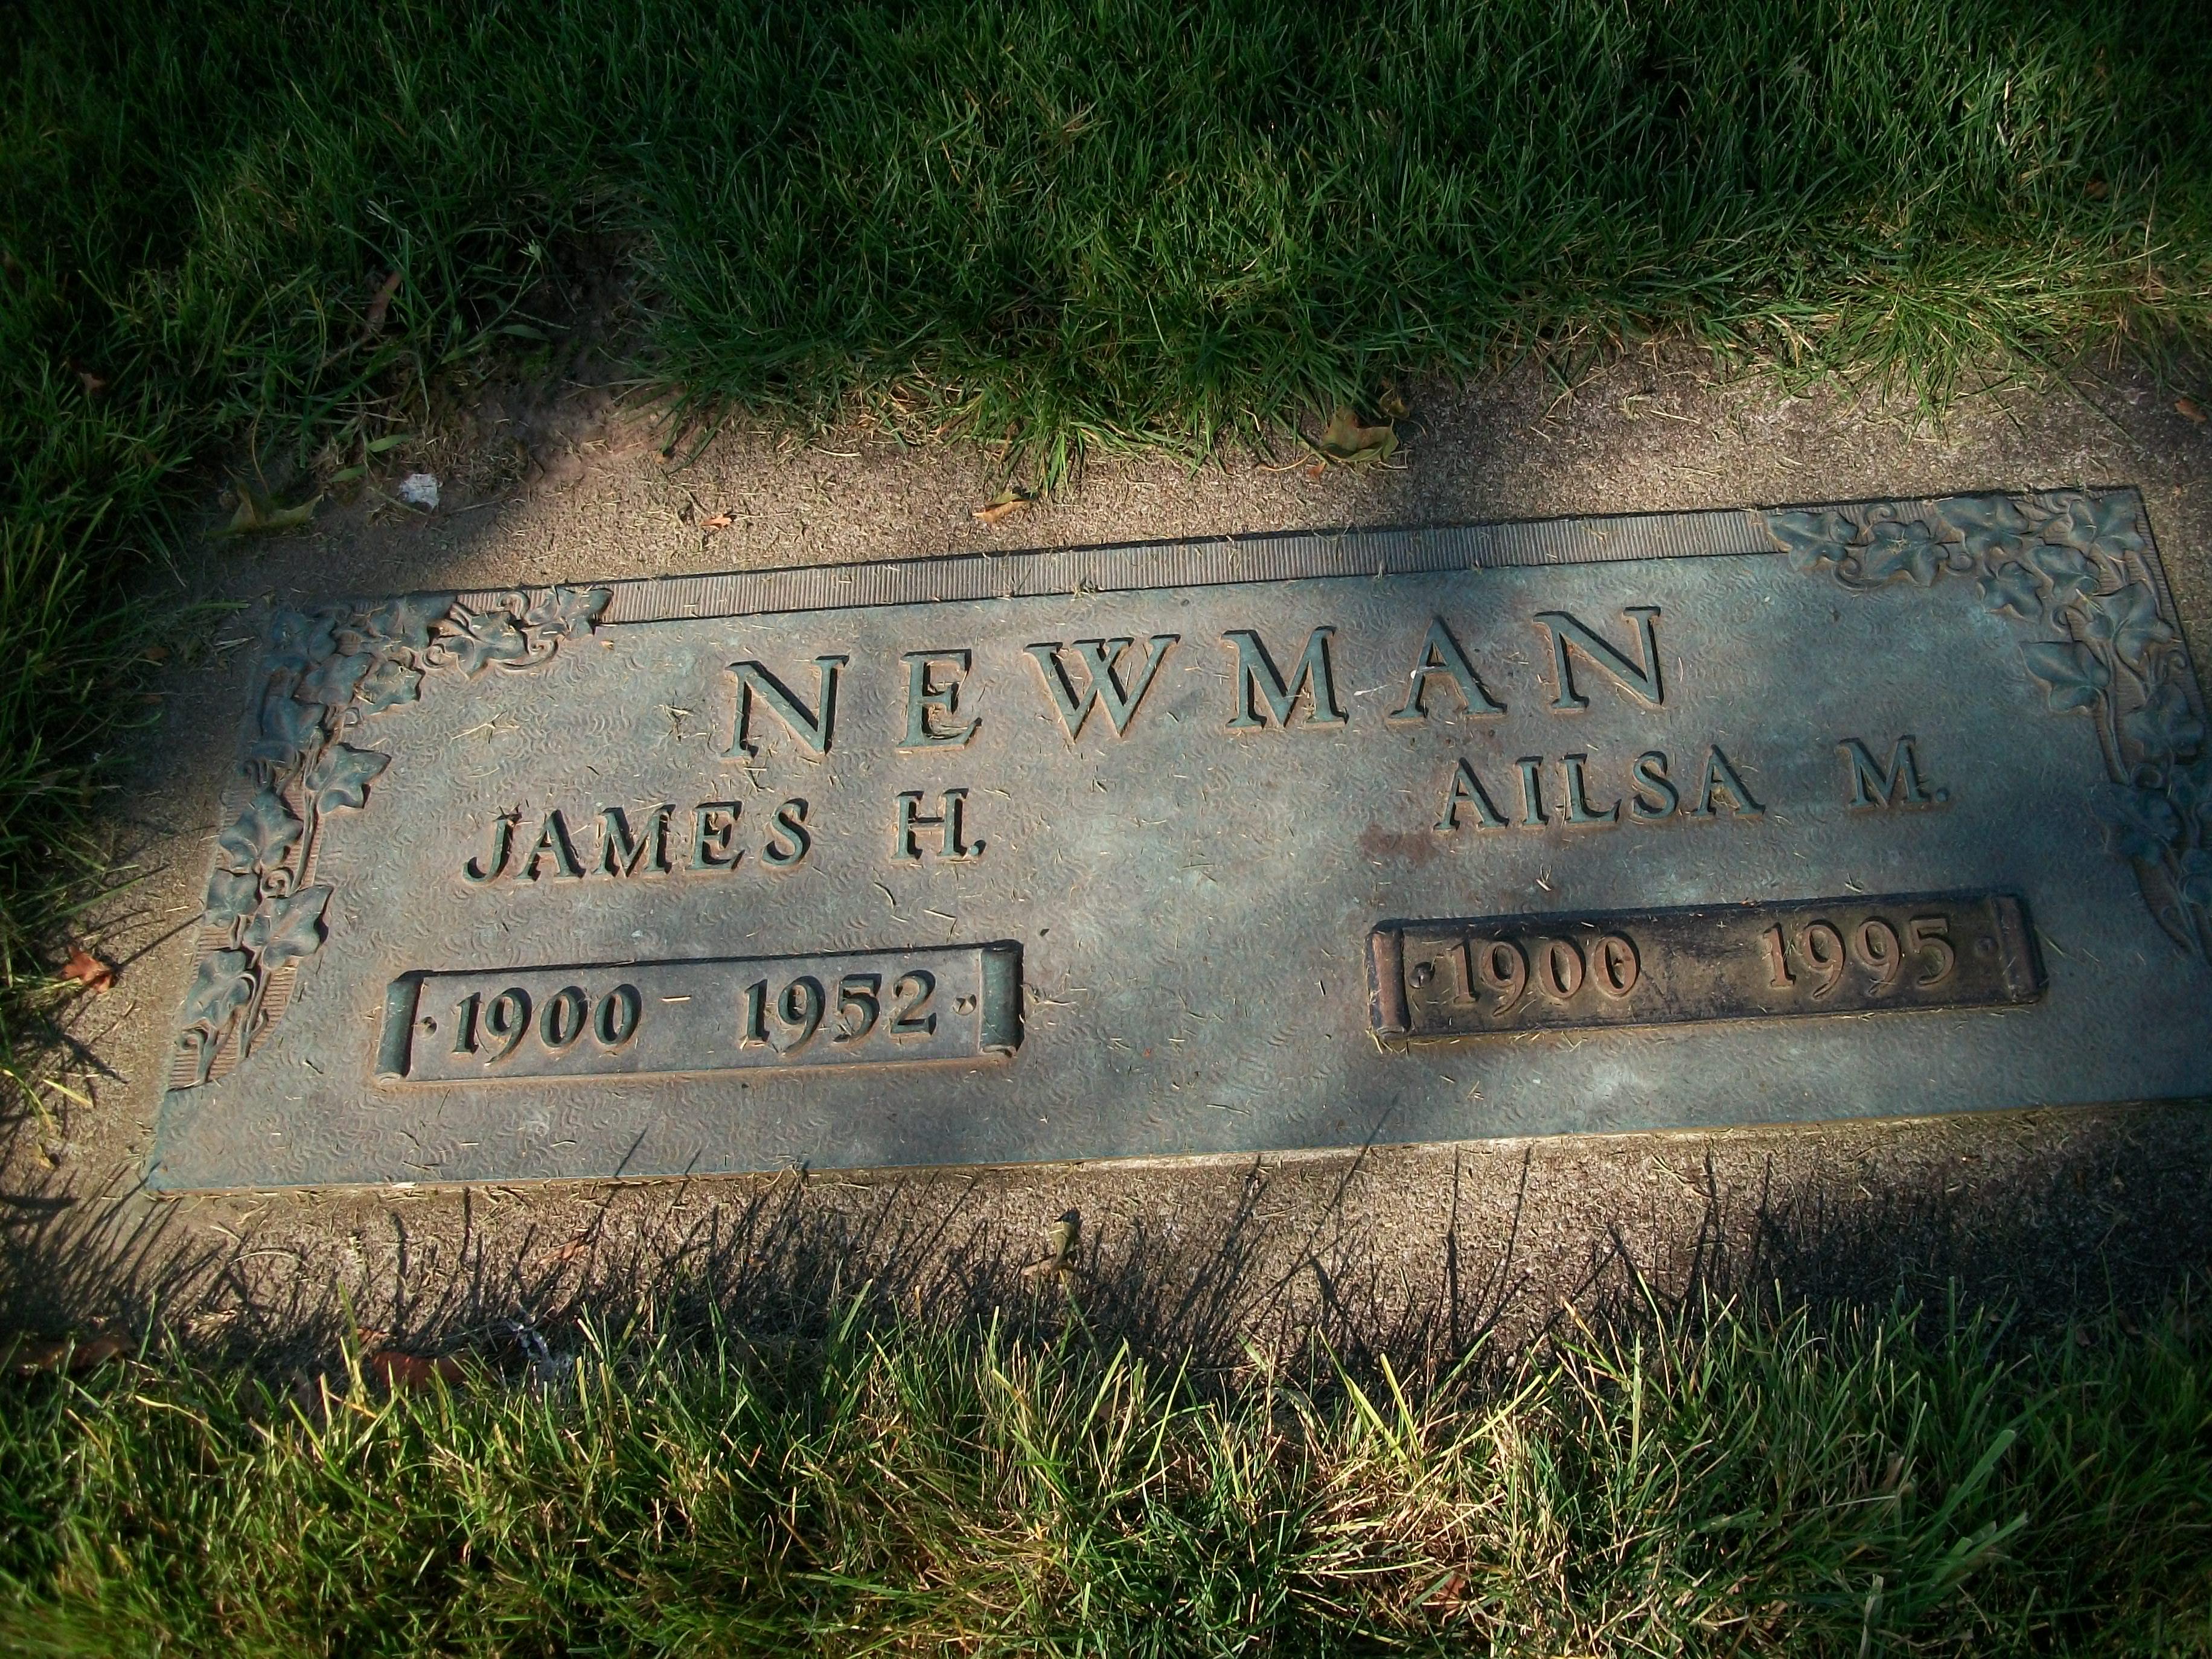 James Henry Newman